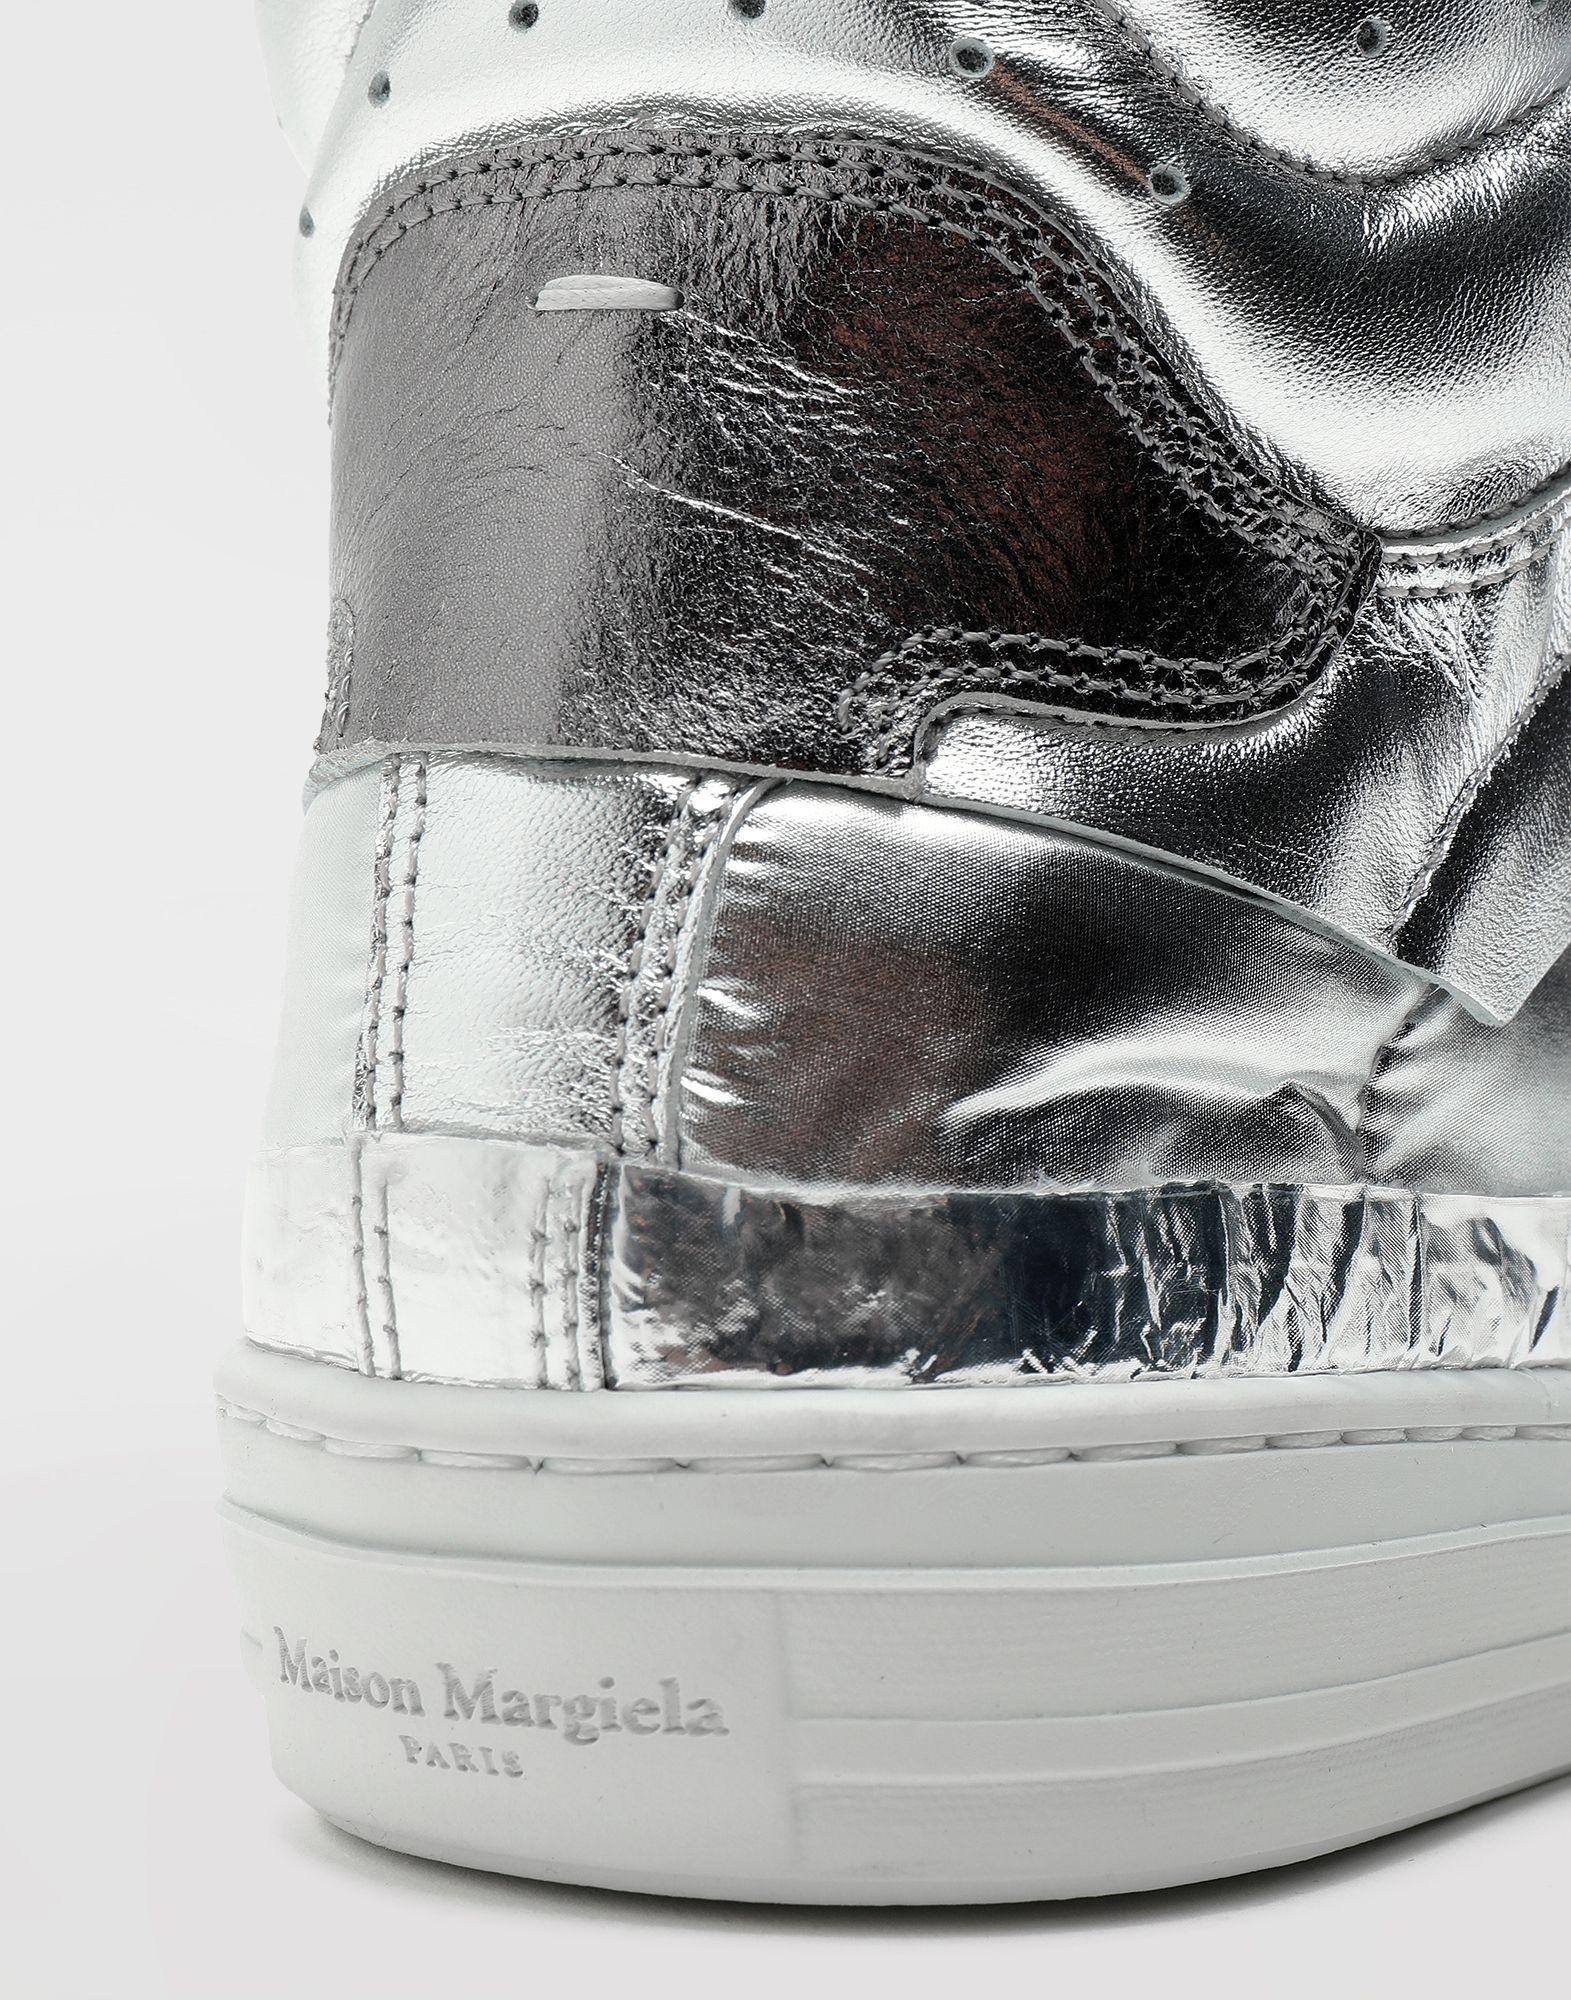 MAISON MARGIELA Sneakers montantes Evolution Sneakers Homme a